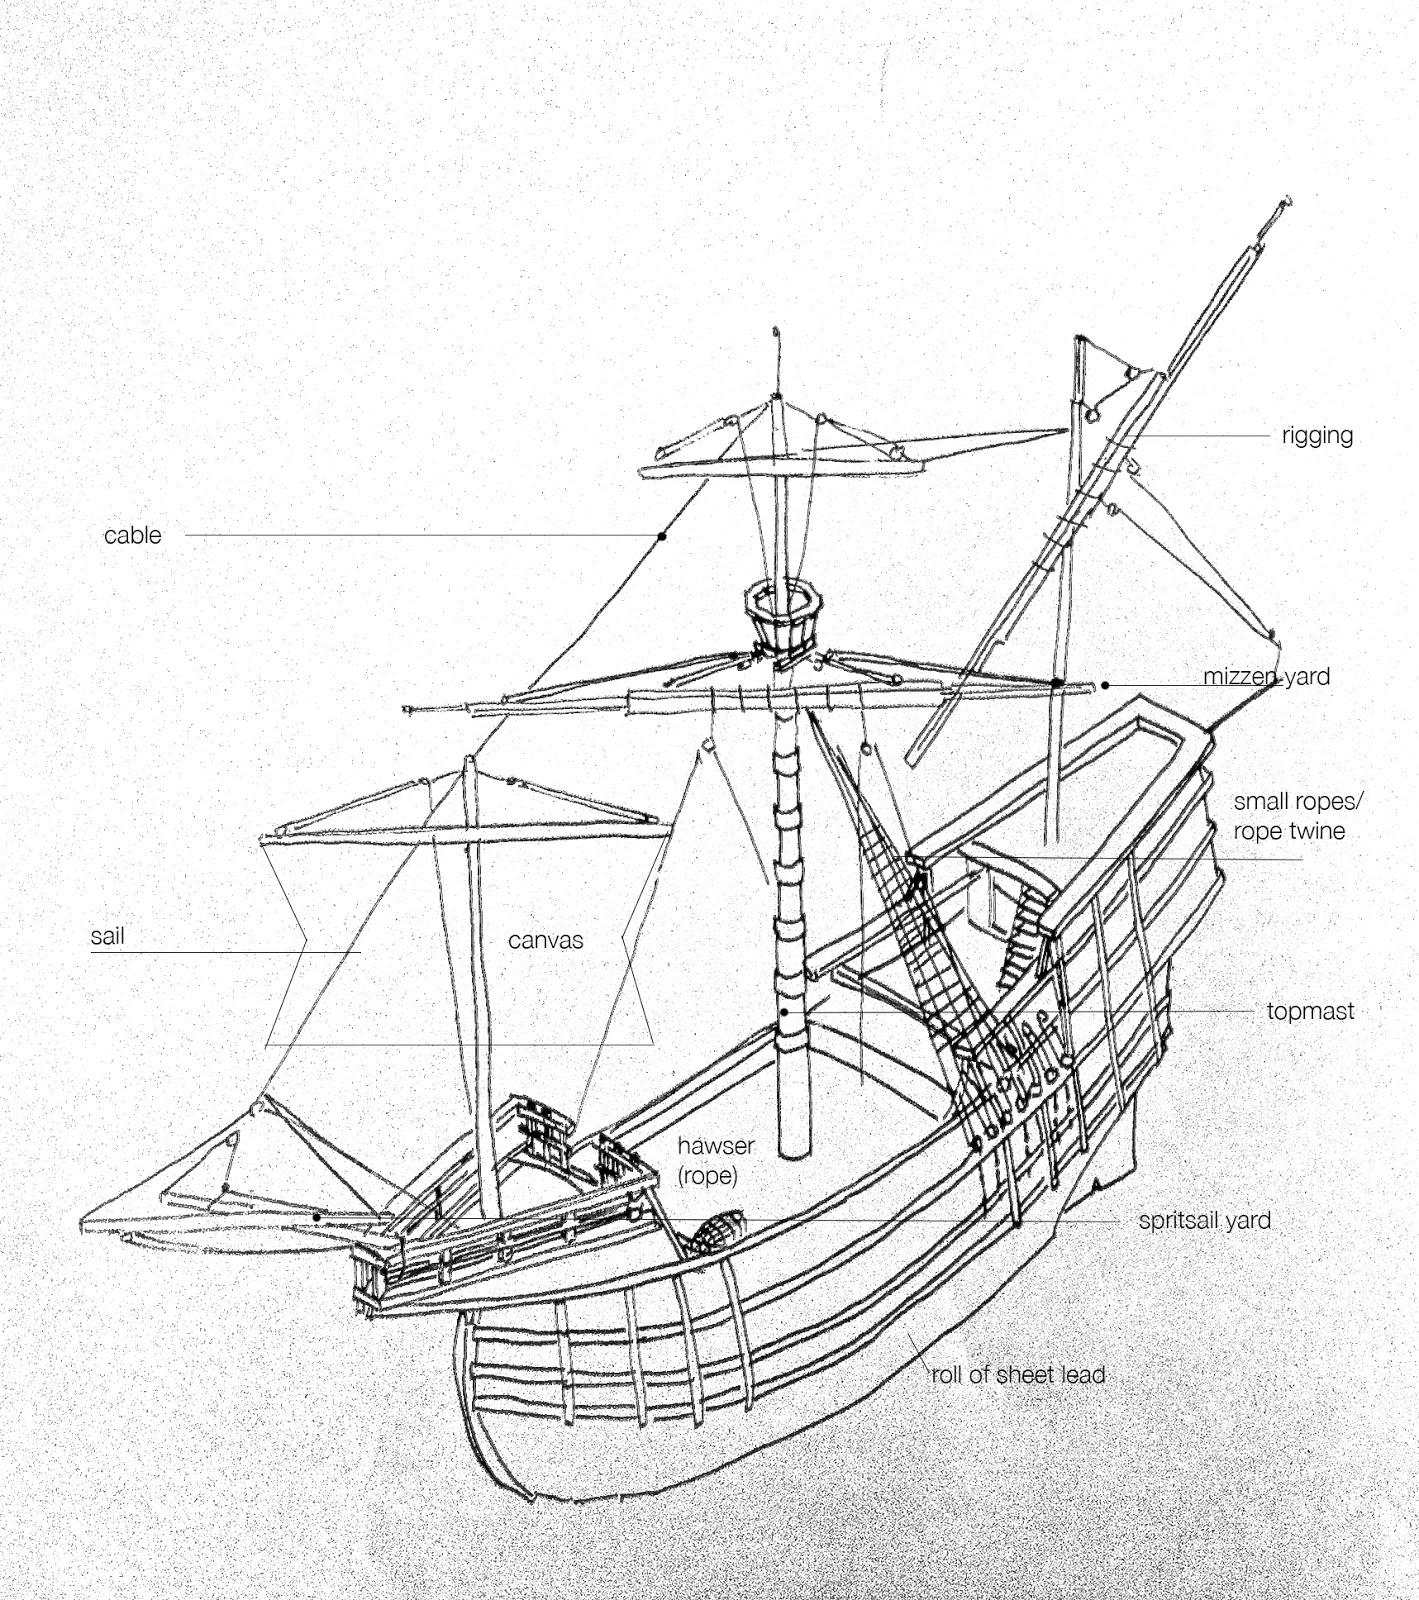 Daniel Defoe U0026 39 S Households For Robinson Crusoe  The Carrack